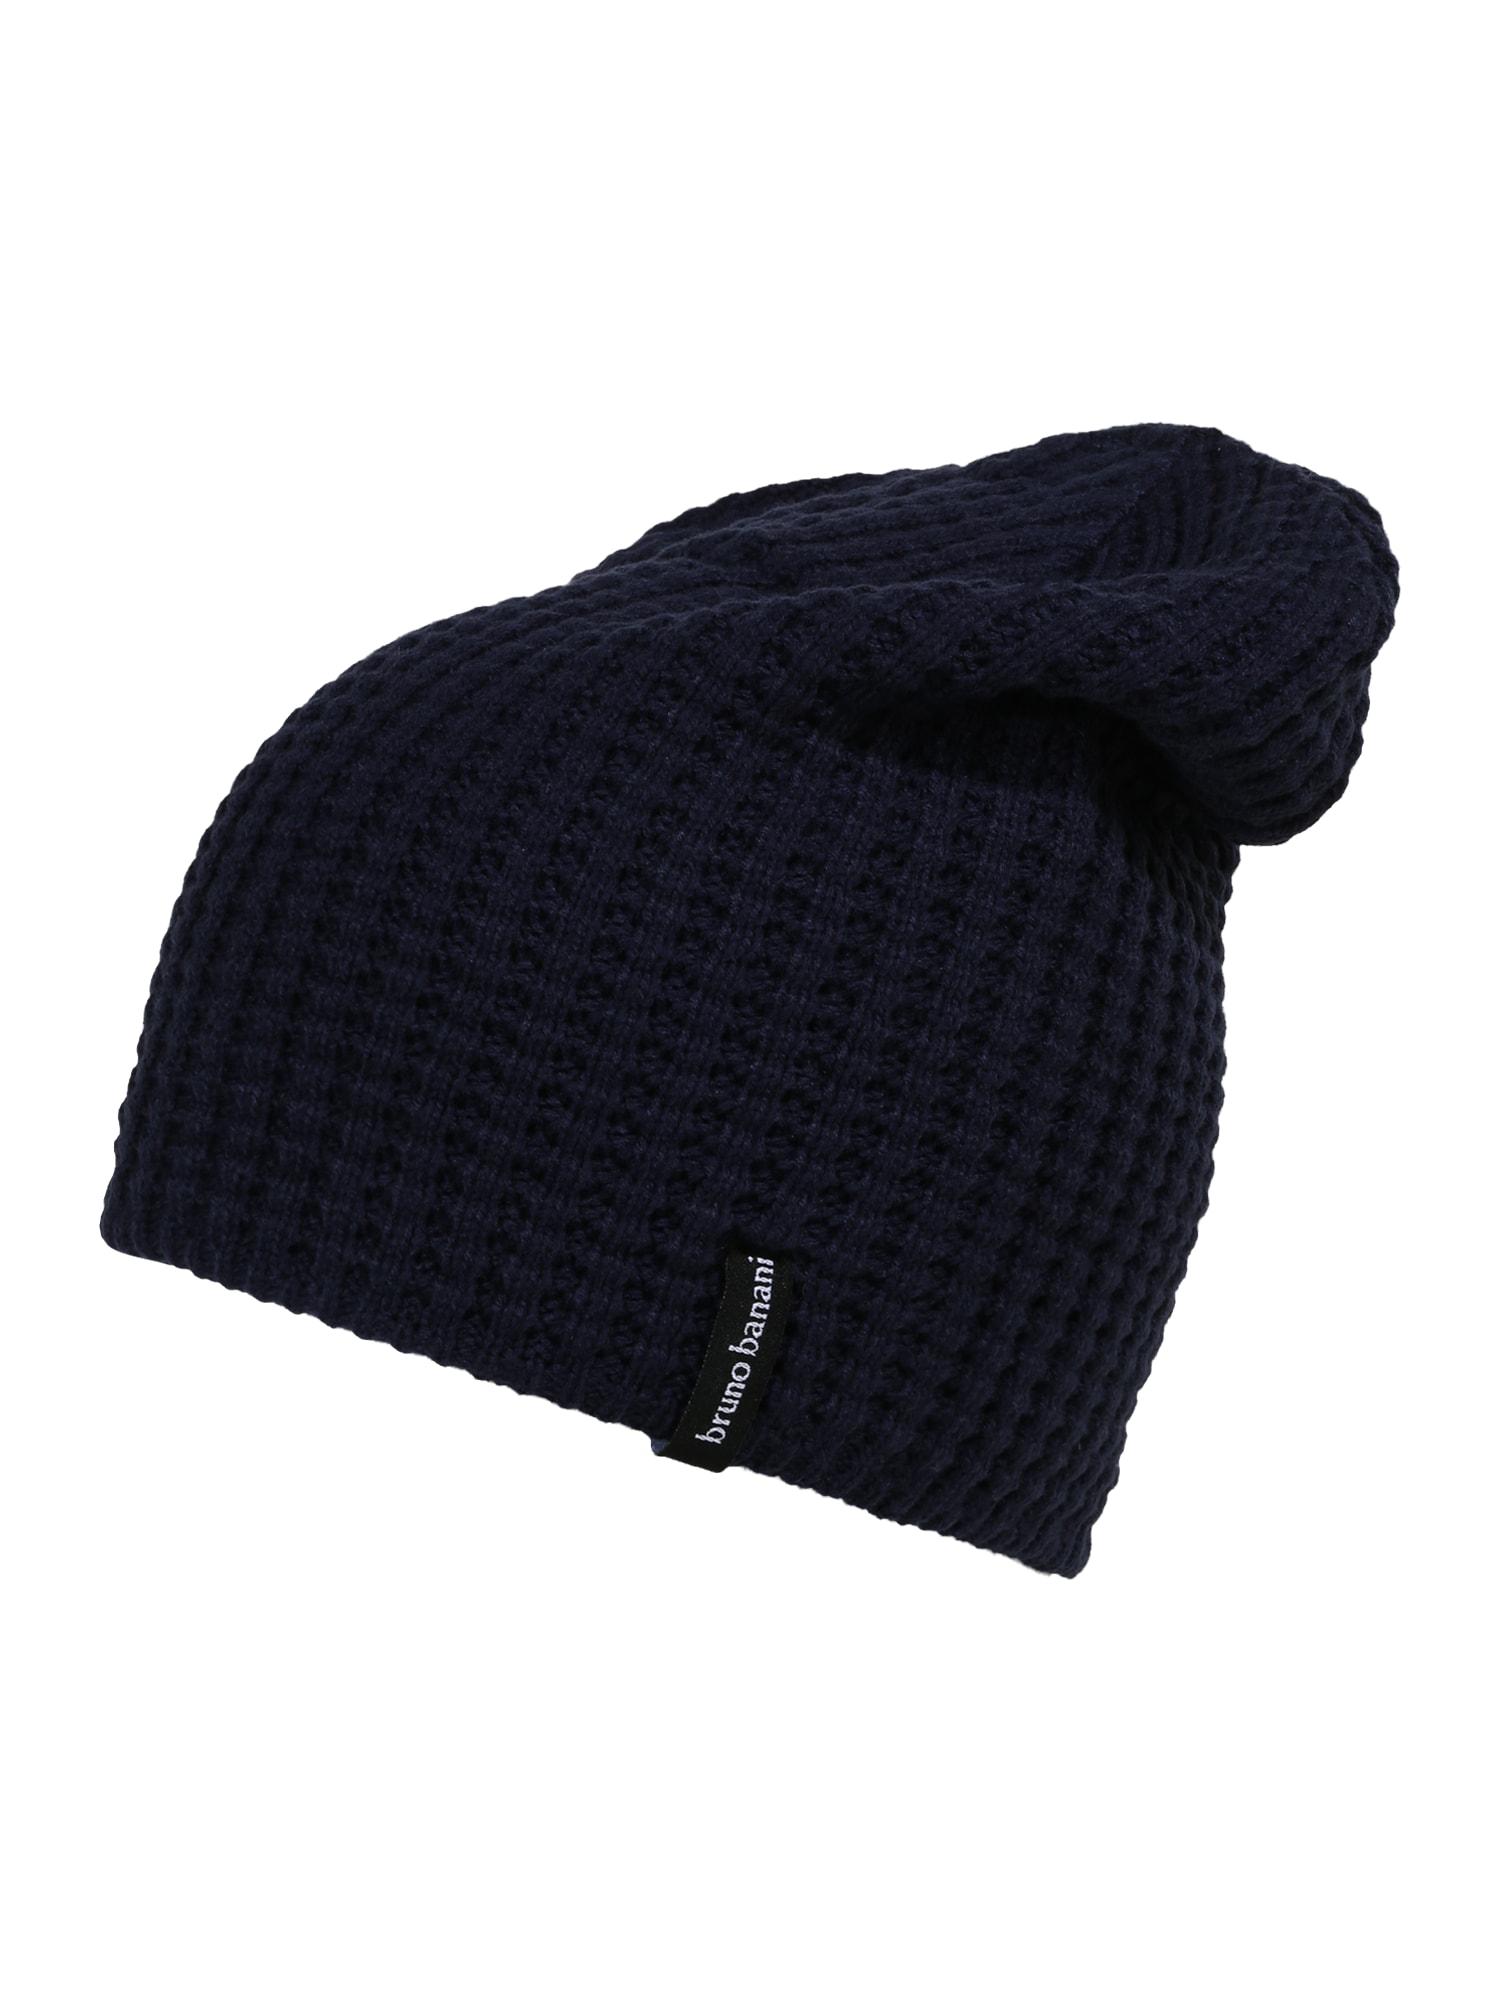 BRUNO BANANI Megzta kepurė tamsiai mėlyna